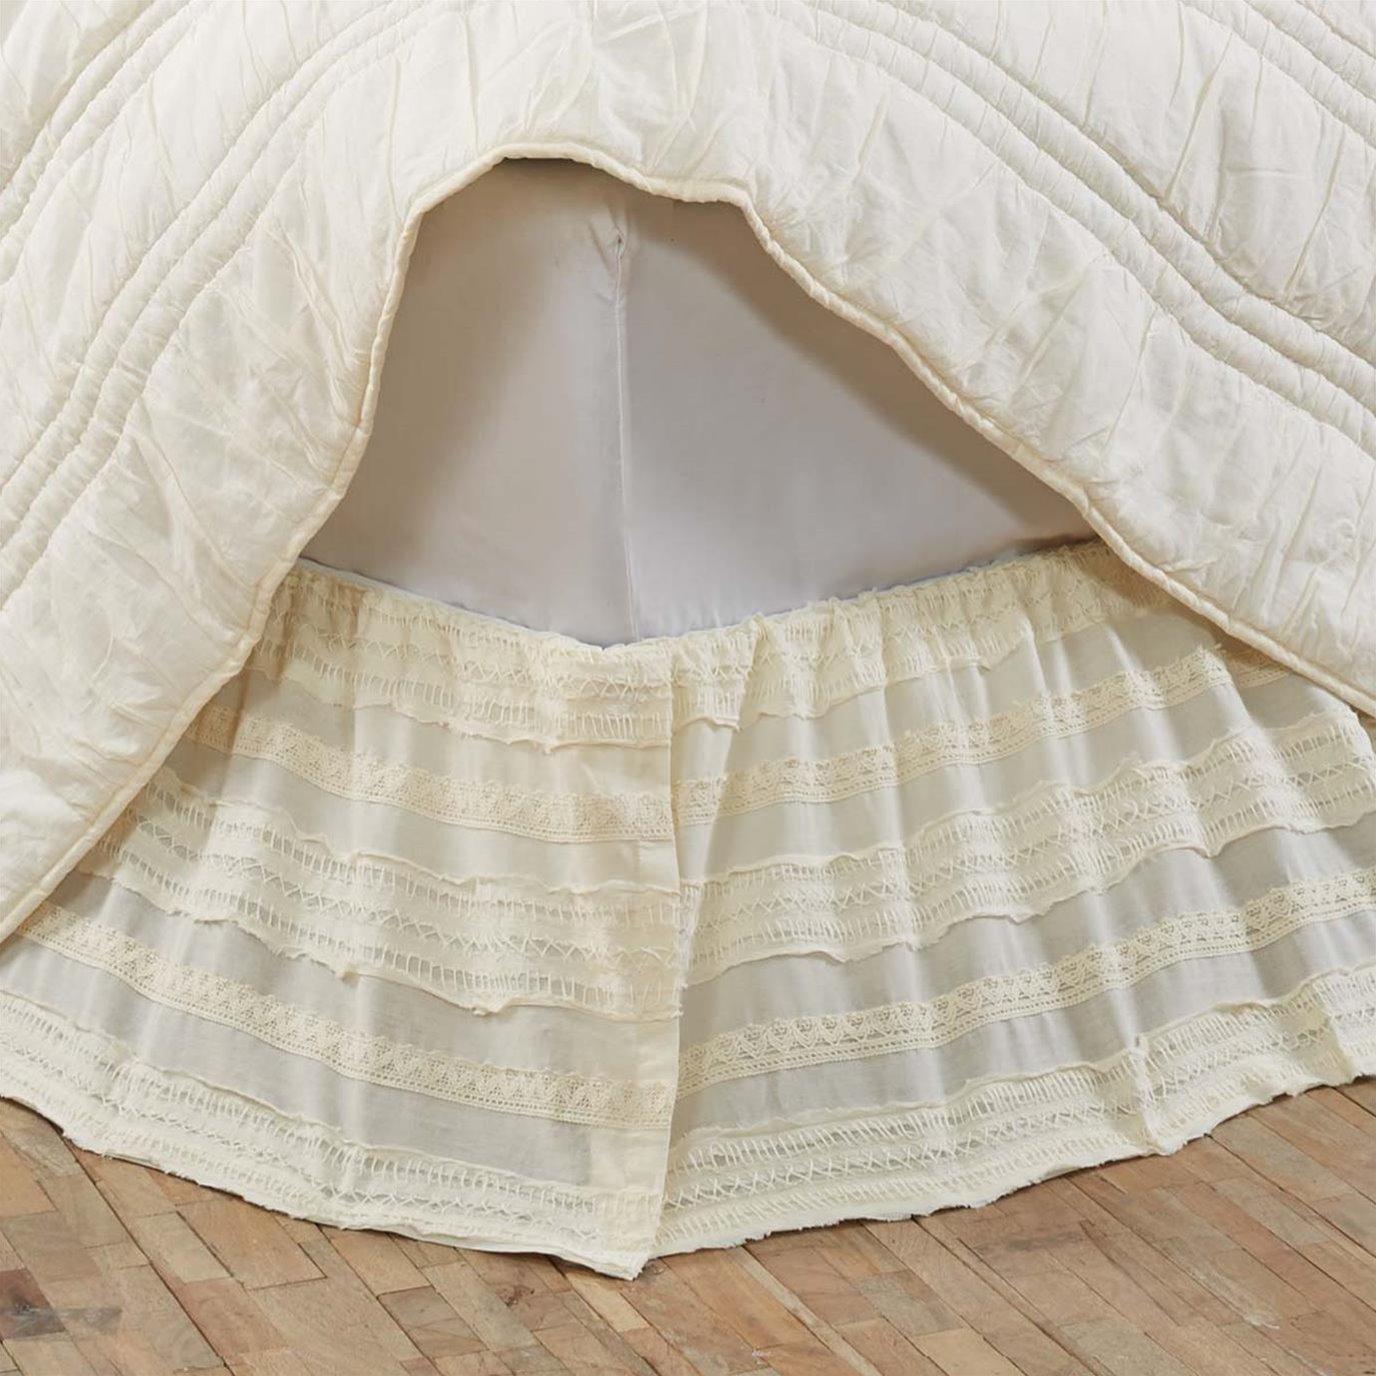 Jasmine Creme King Bed Skirt 78x80x16